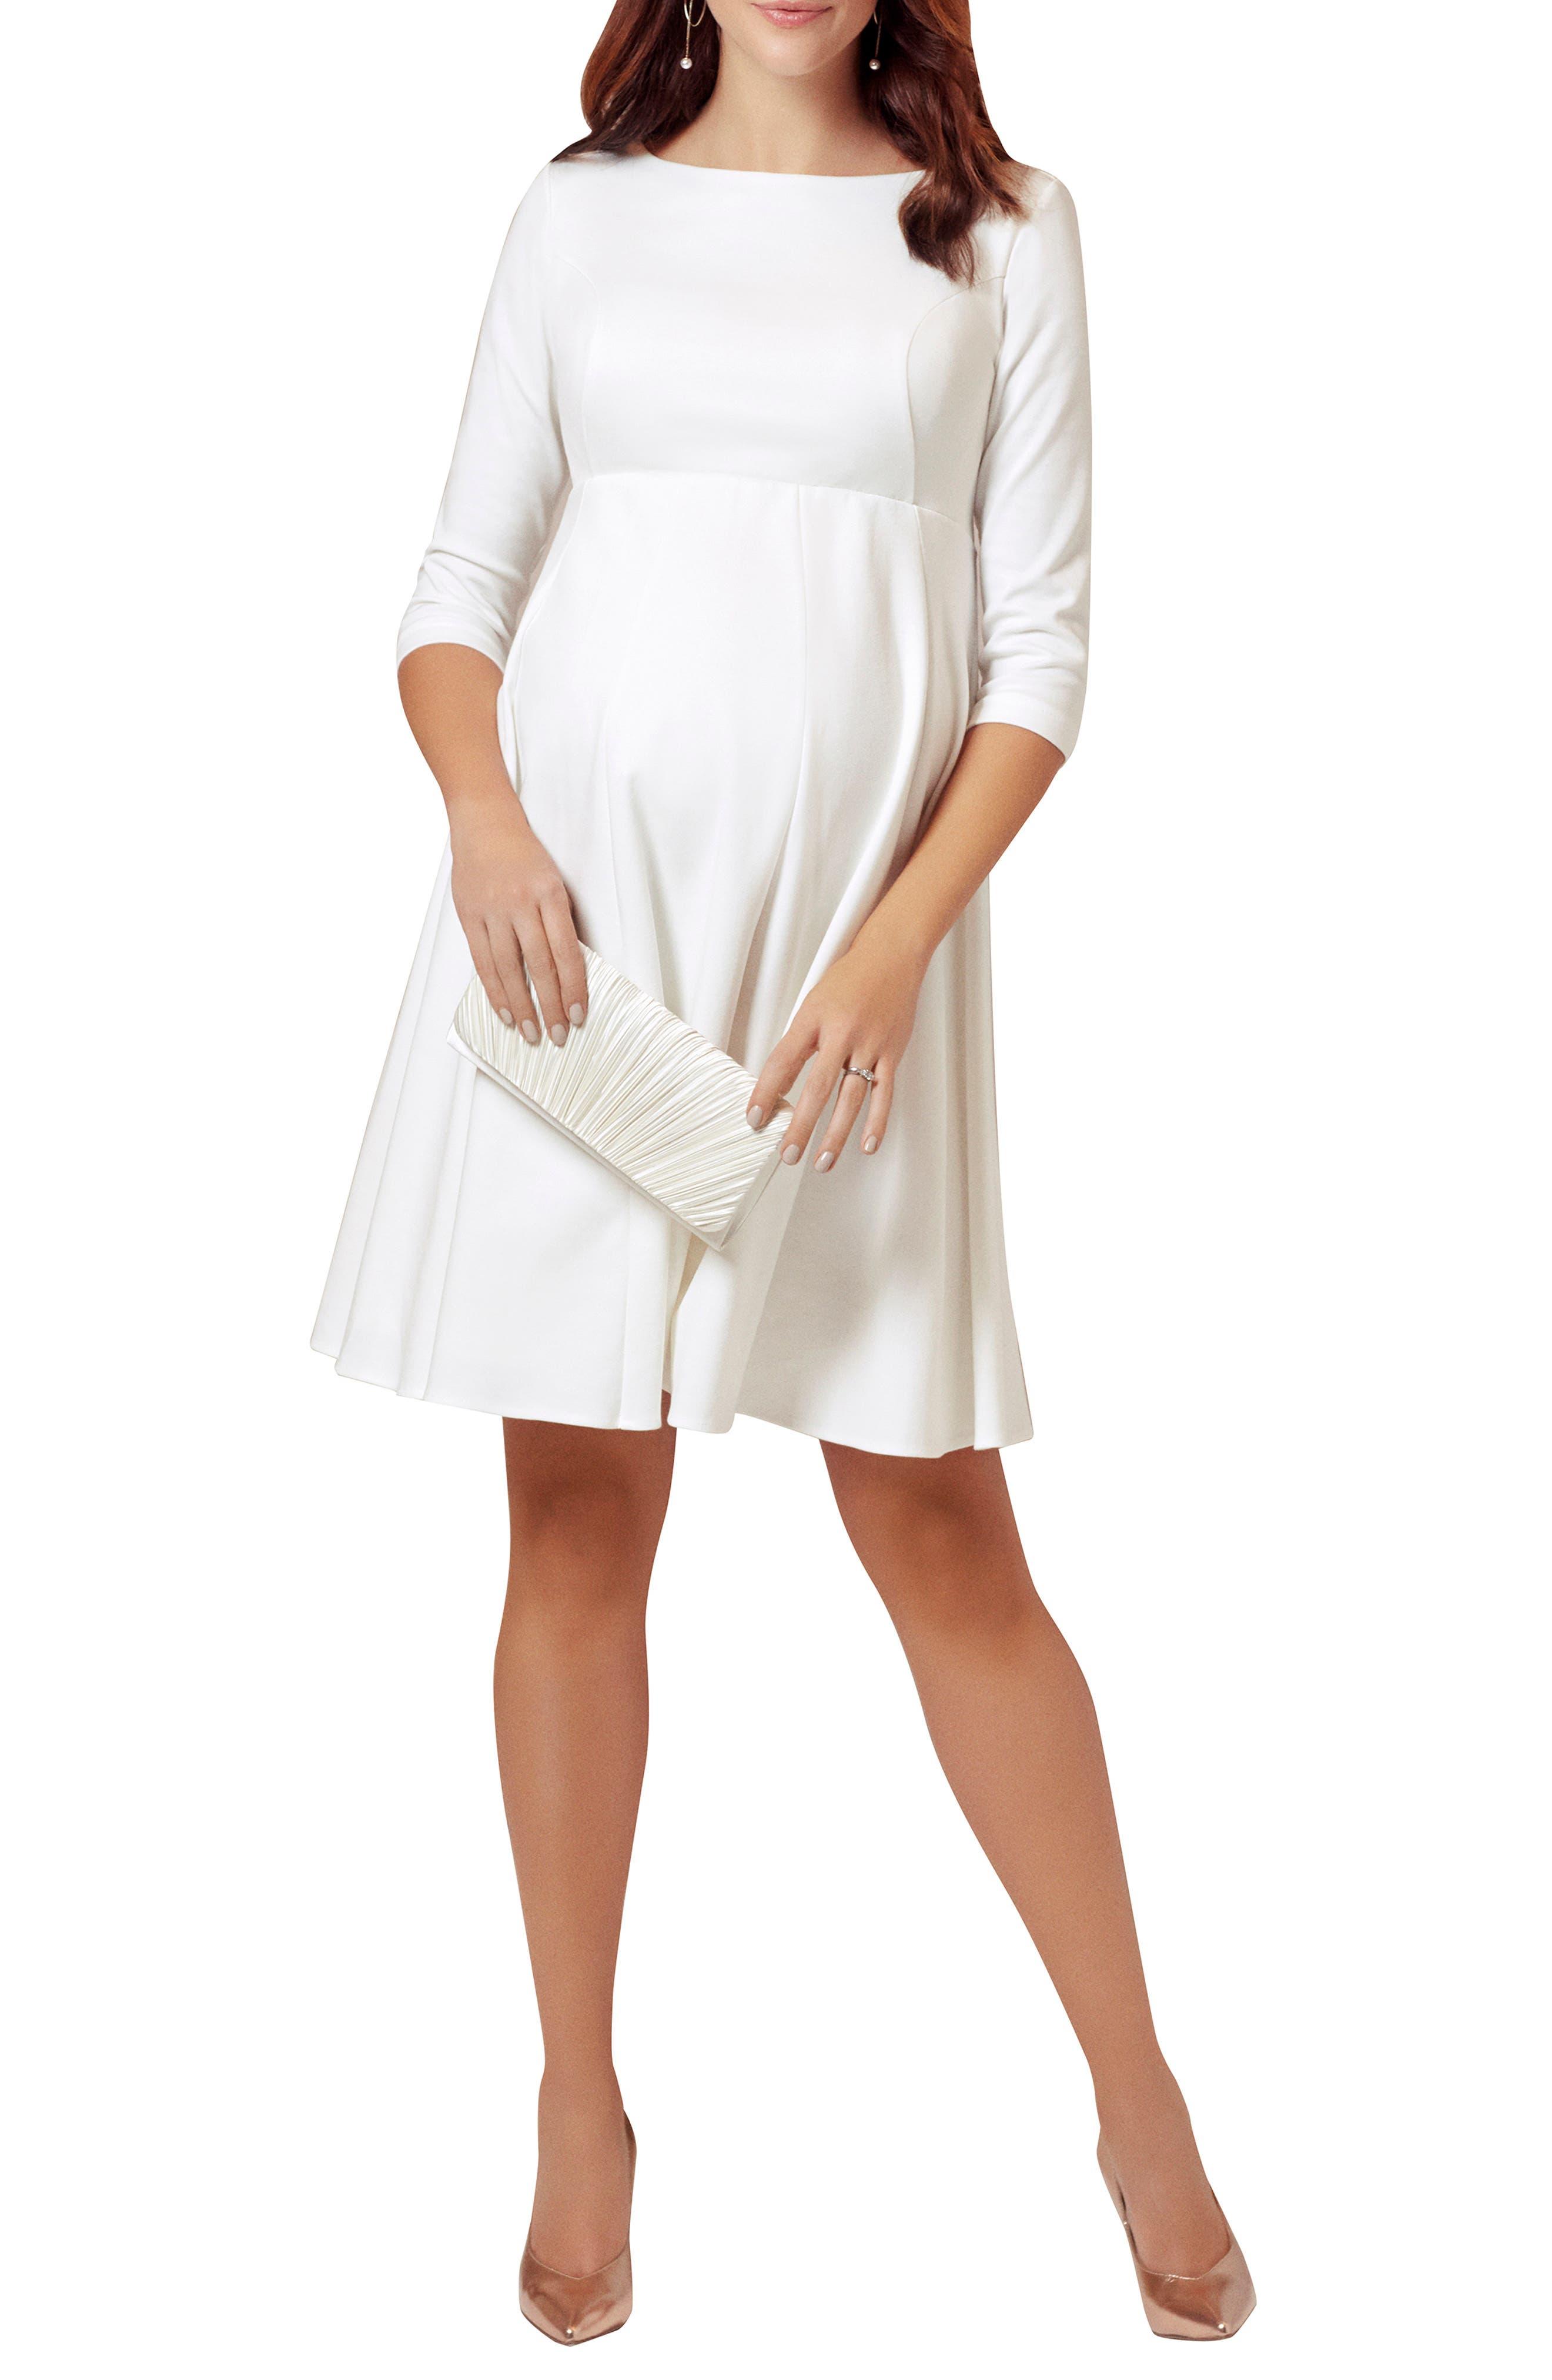 Vintage Maternity Clothes History Womens Tiffany Rose Sienna Maternity Dress $205.00 AT vintagedancer.com